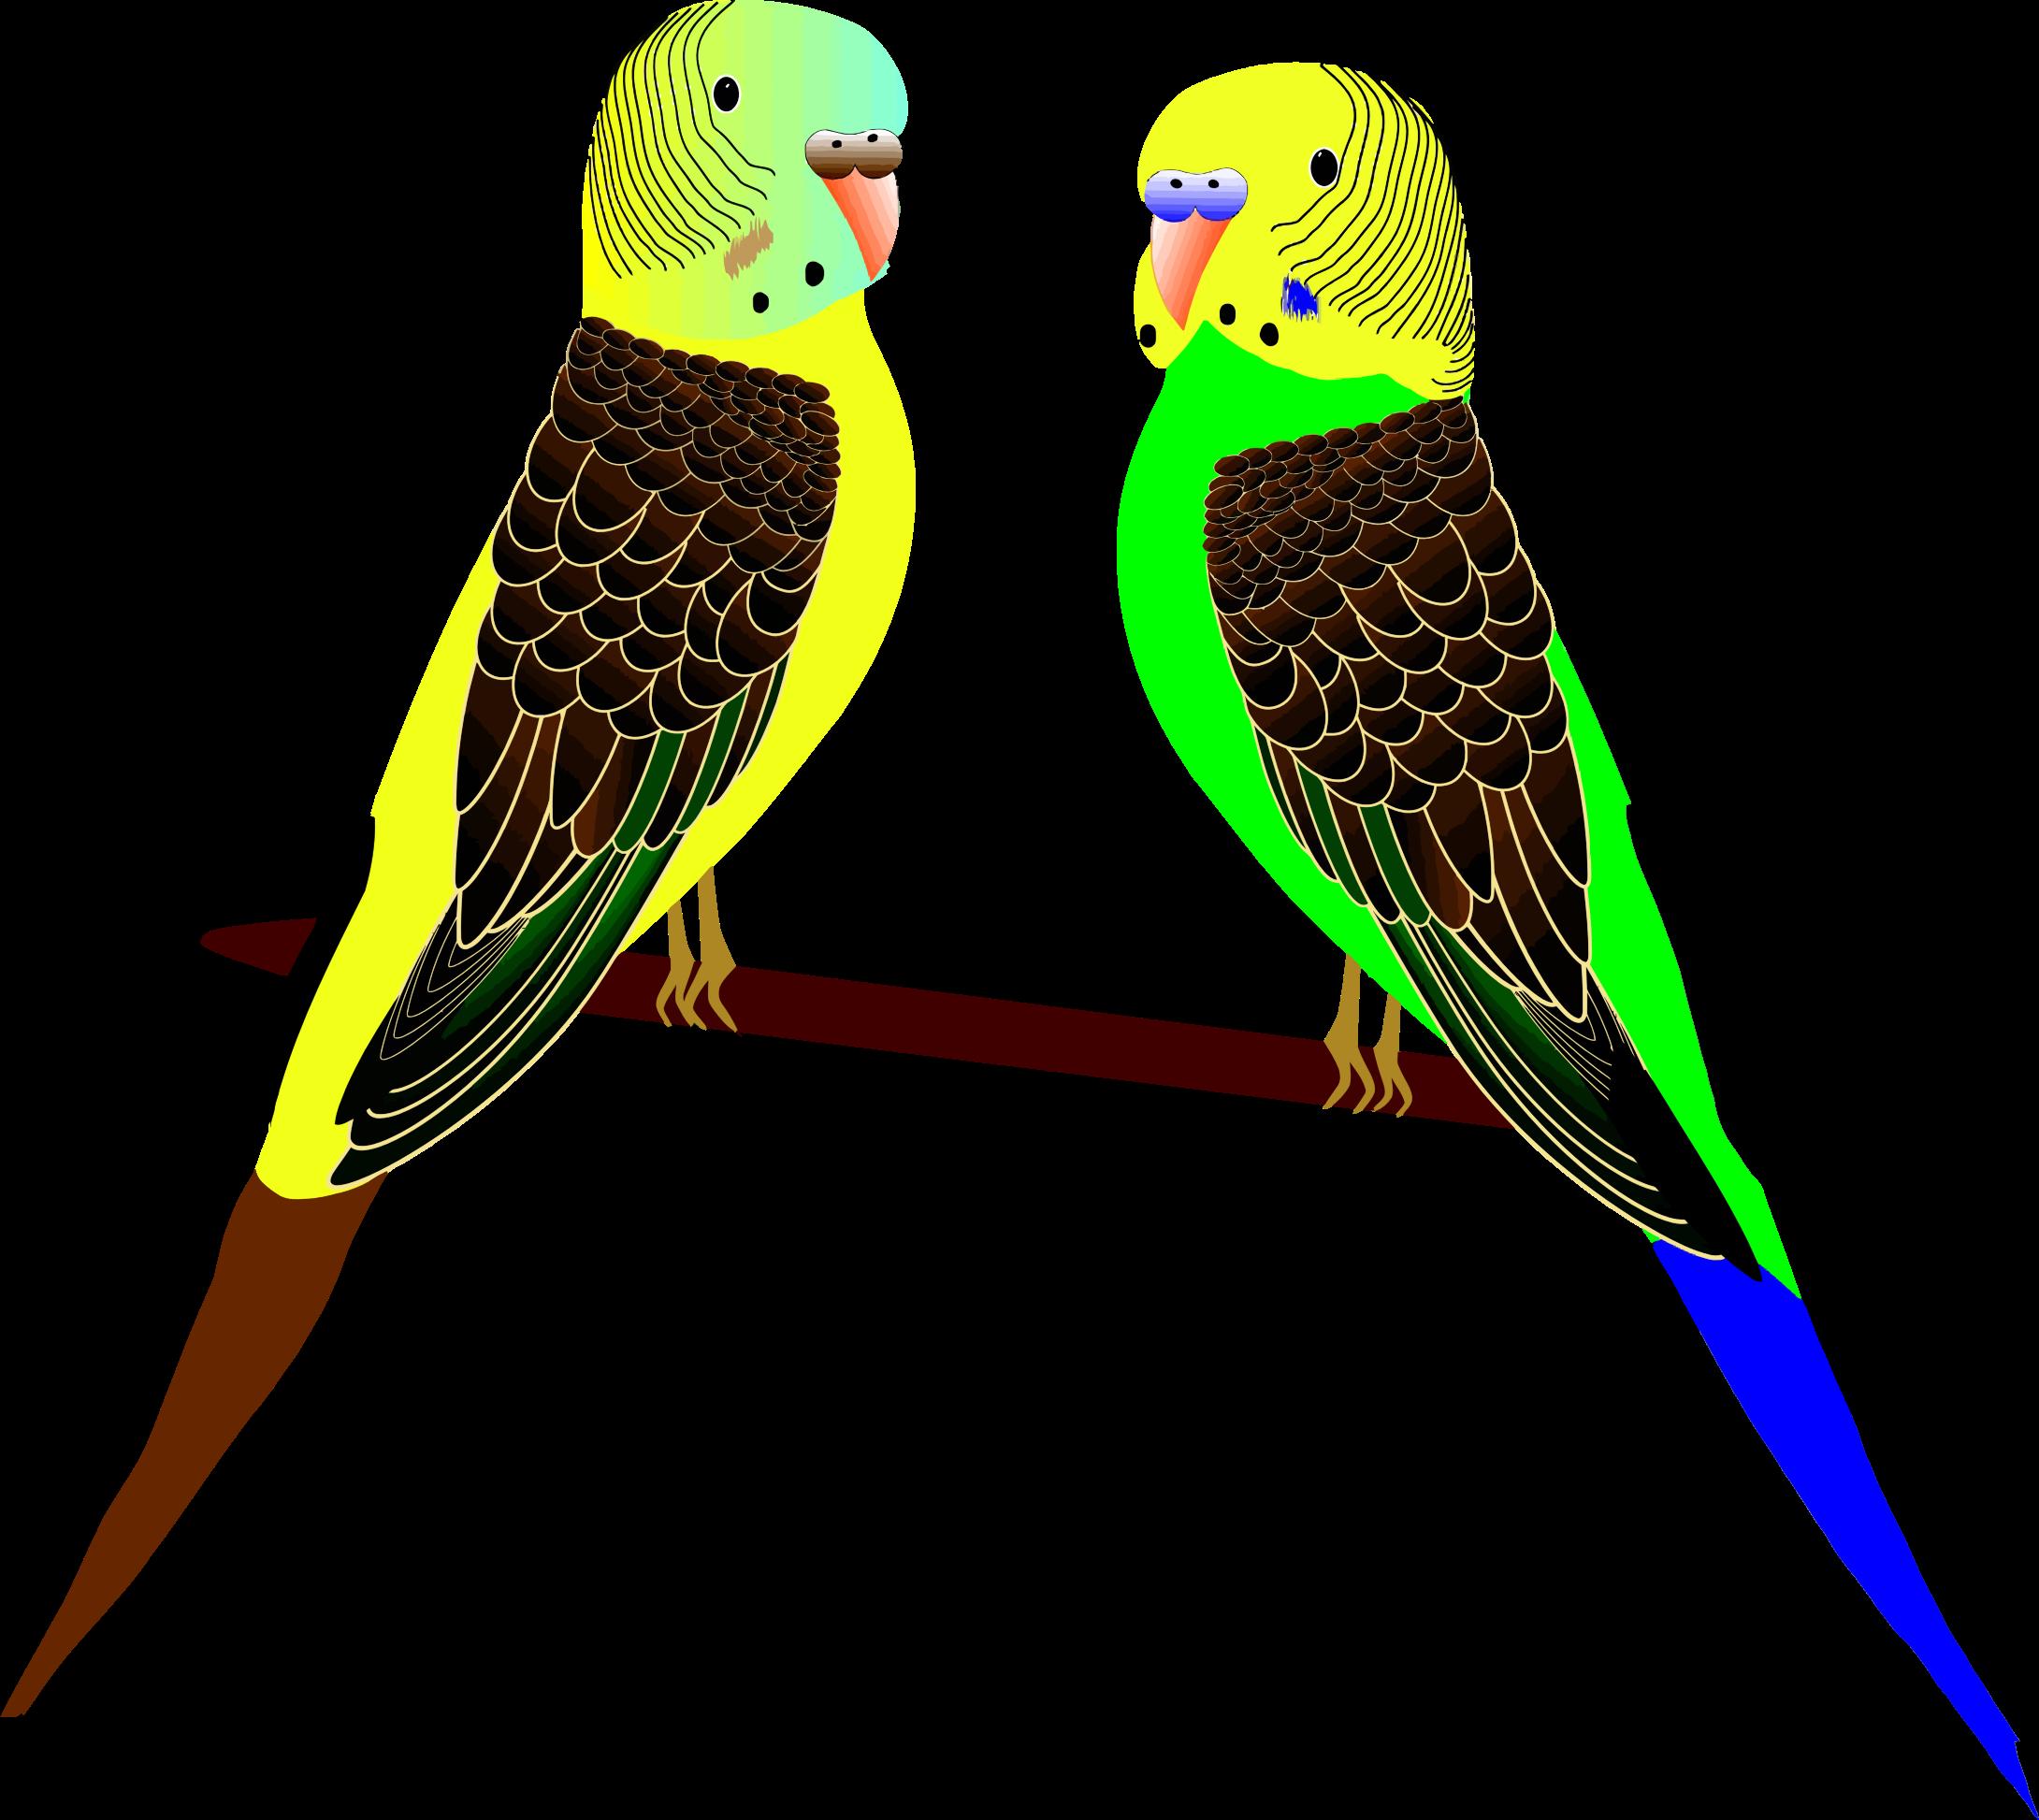 Parakeets illustration big image. Parrot clipart parakeet